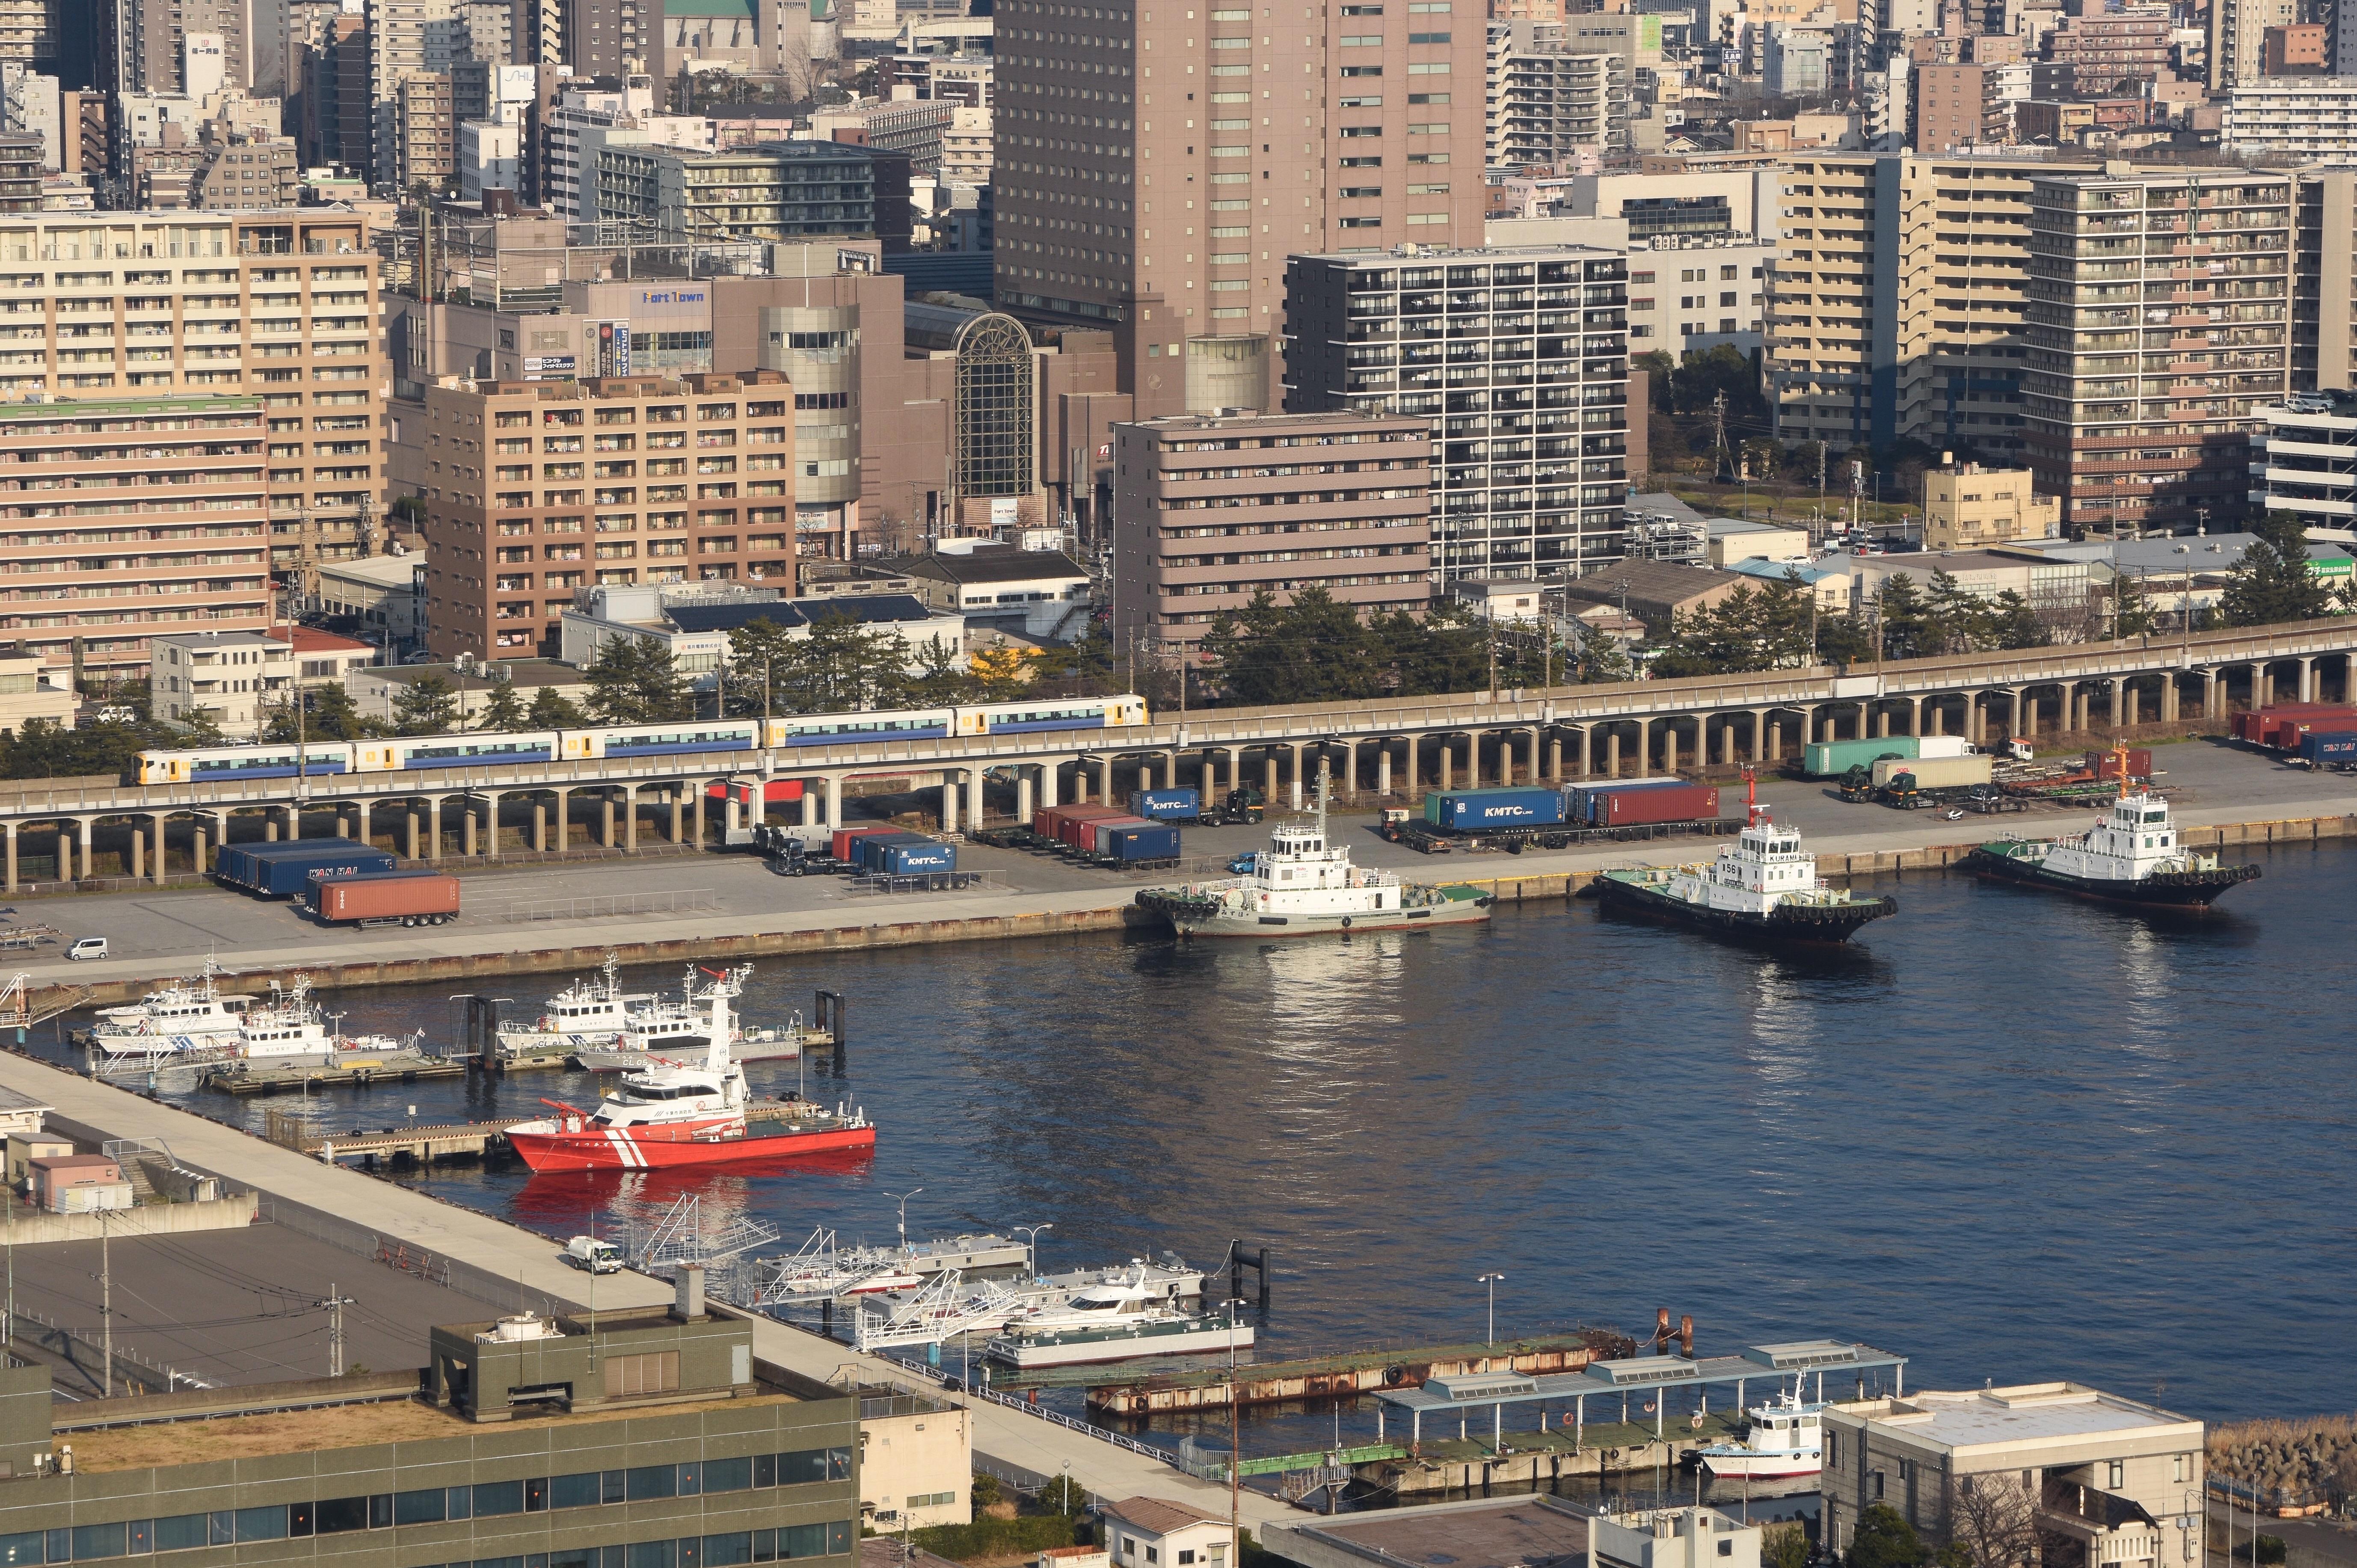 f:id:Nagaoka103:20190302211900j:image